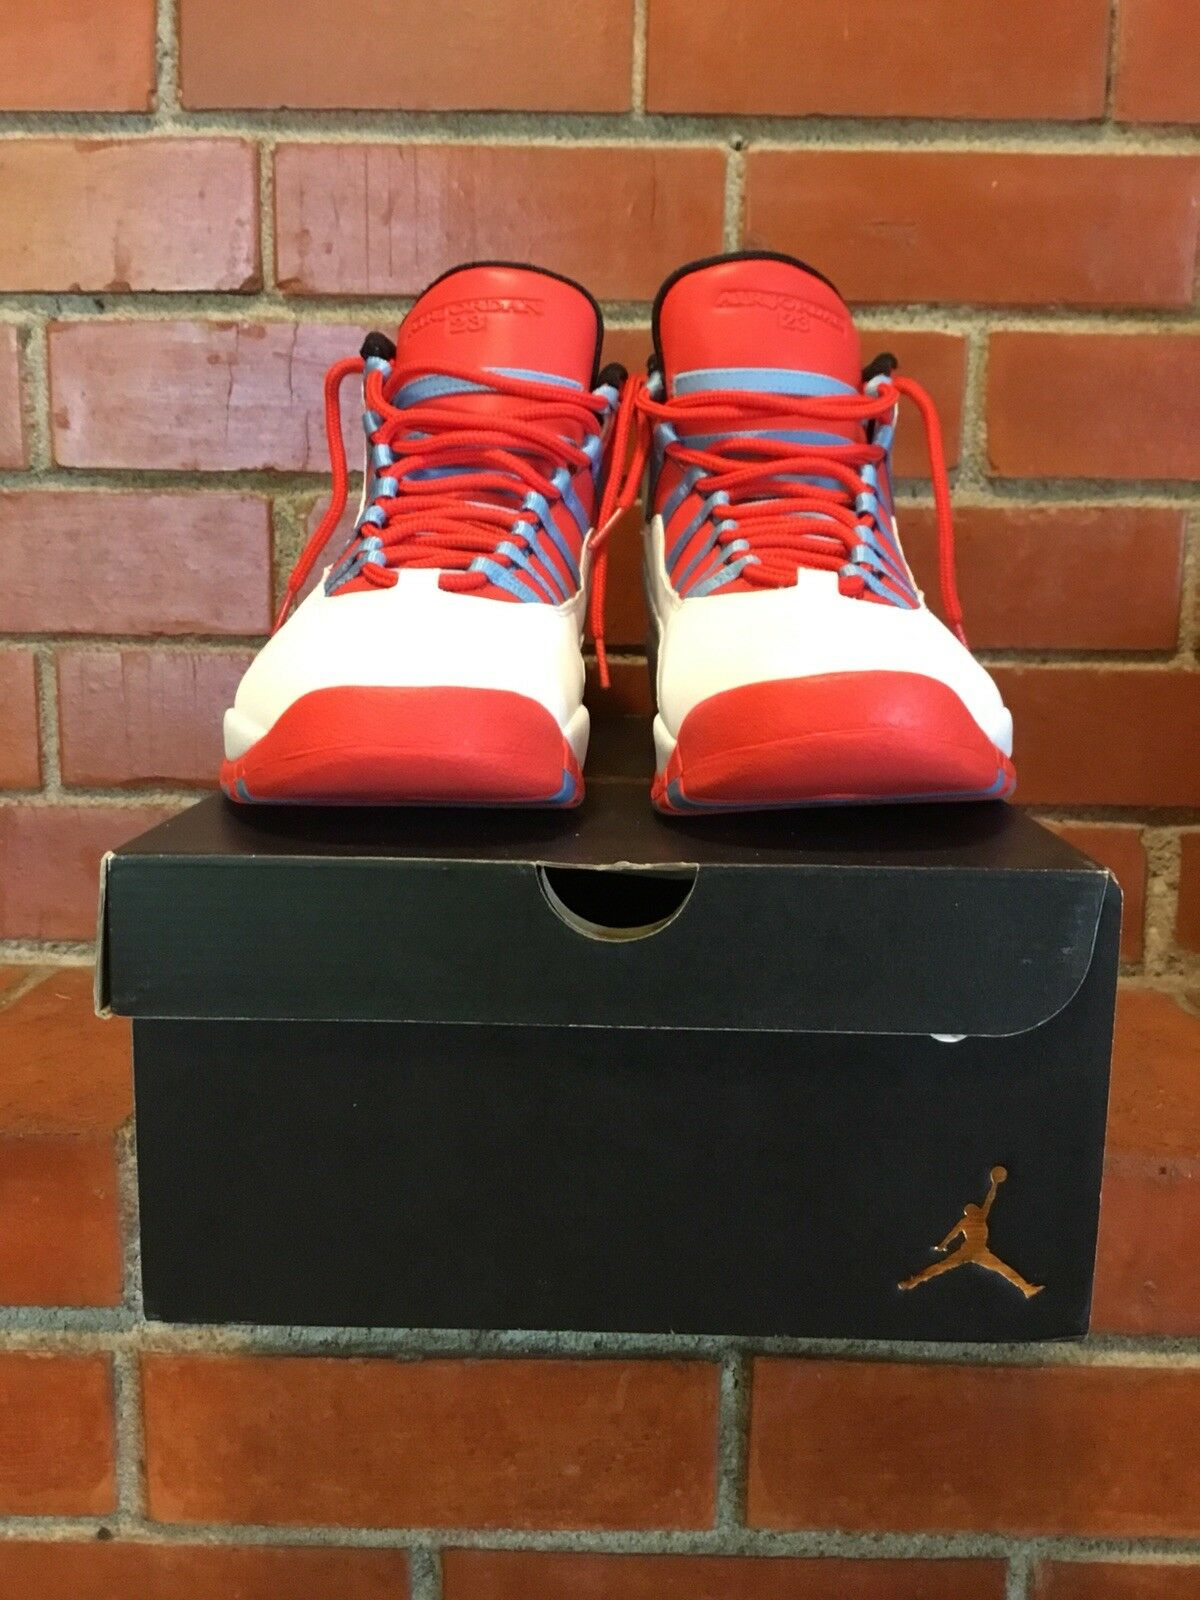 Air Jordan 10 Retro Chicago Flag Size 13 White/UniversityBlue/Crimson 310805-114